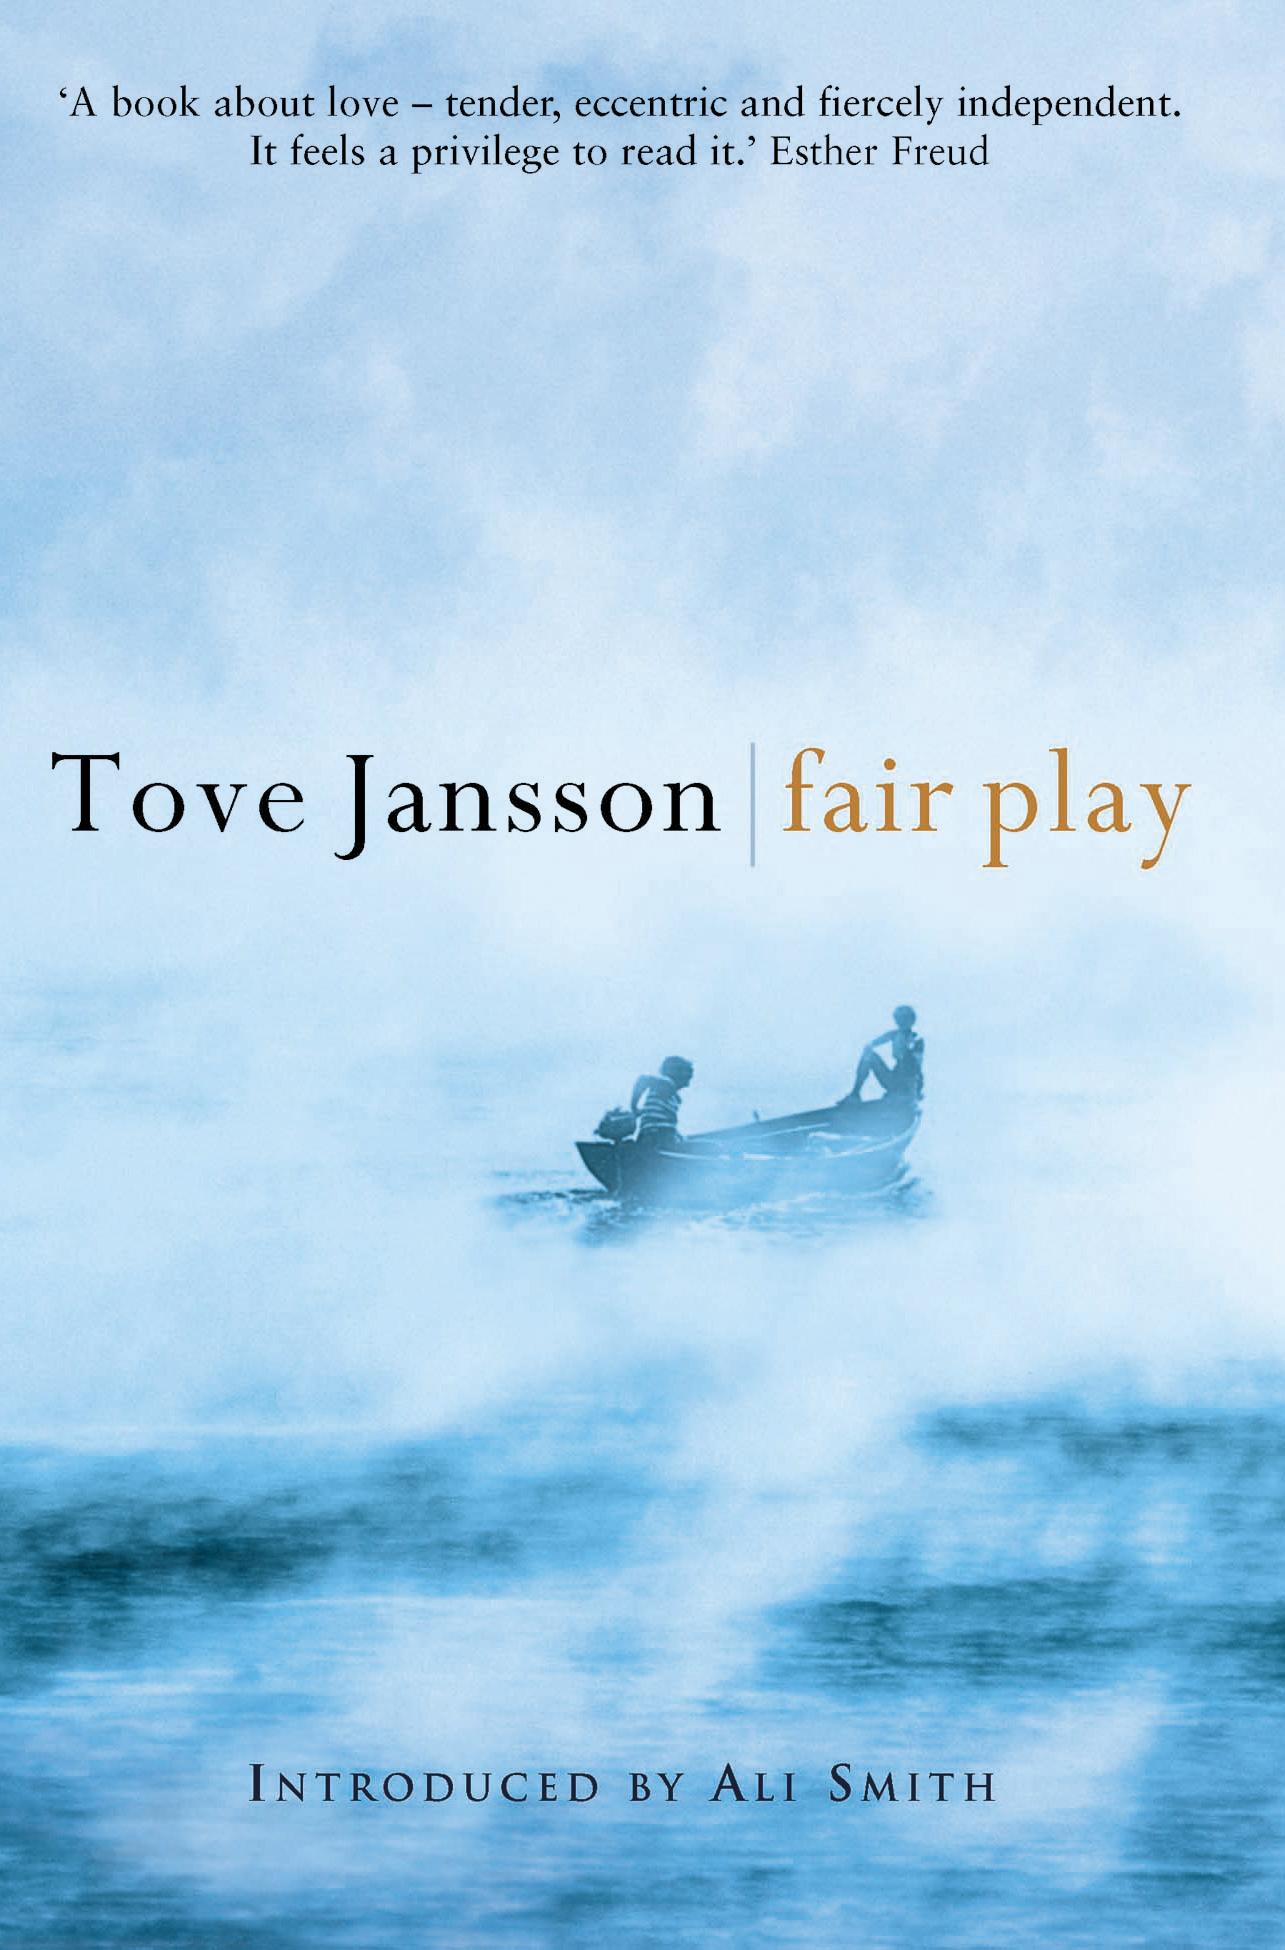 Tove-Jansson-Fair-Play-Sort-of-Books.jpg